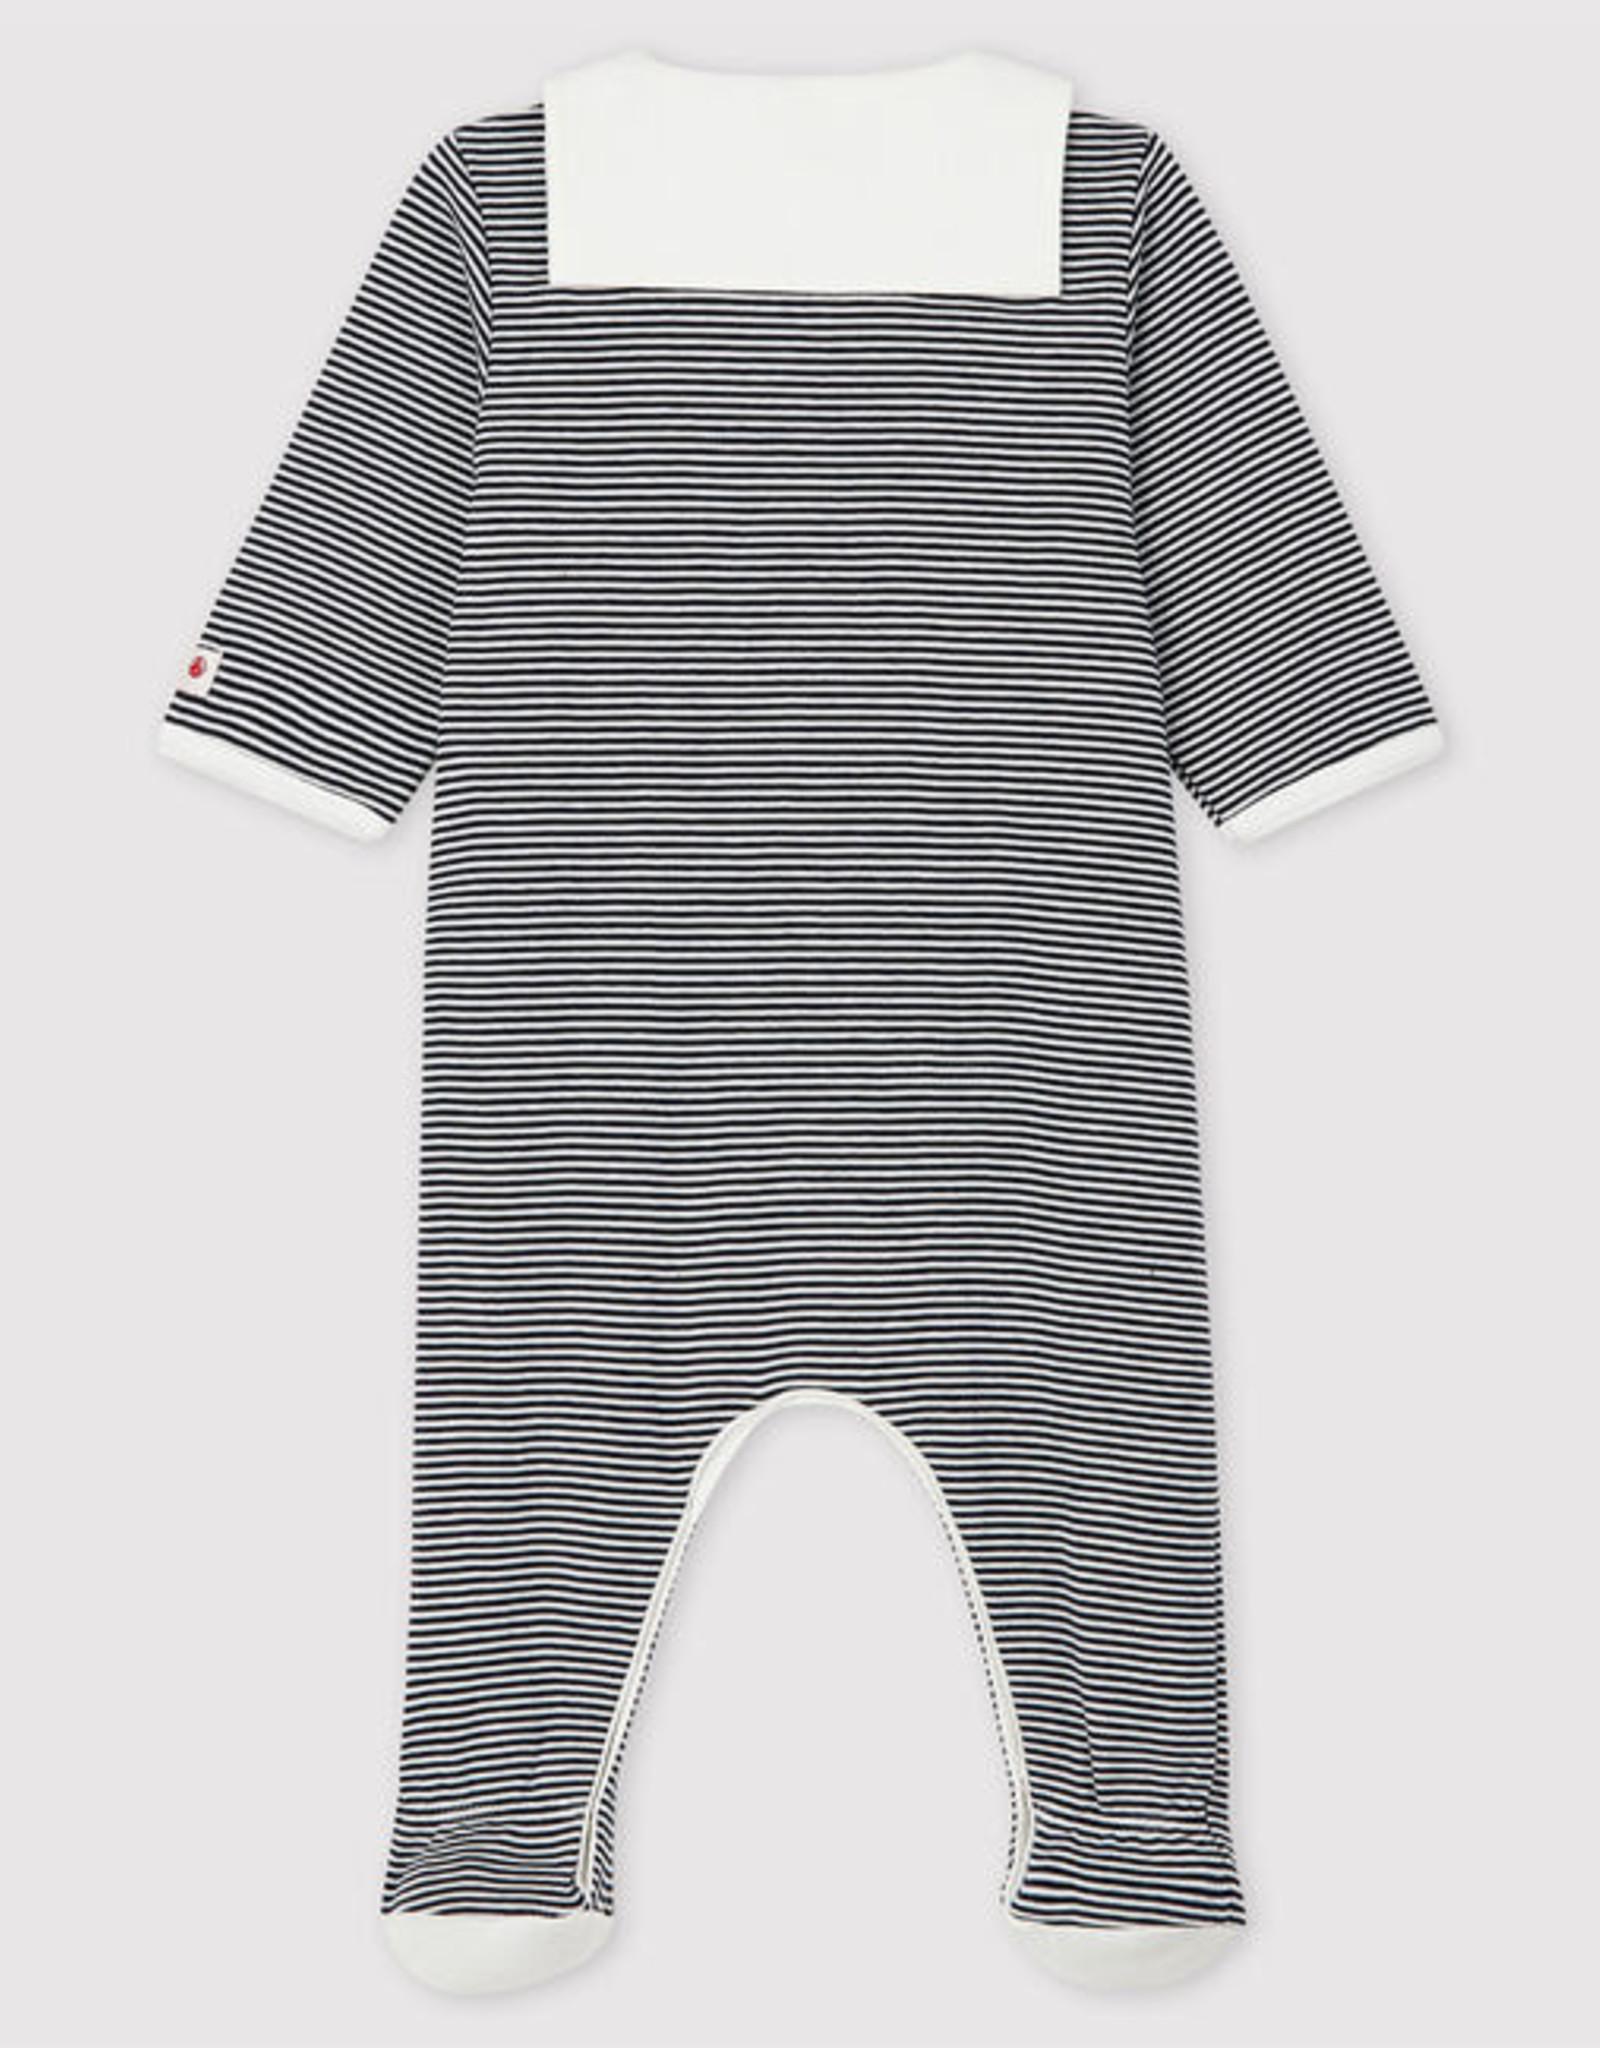 Petit Bateau Babies' Stripy Sleepsuit